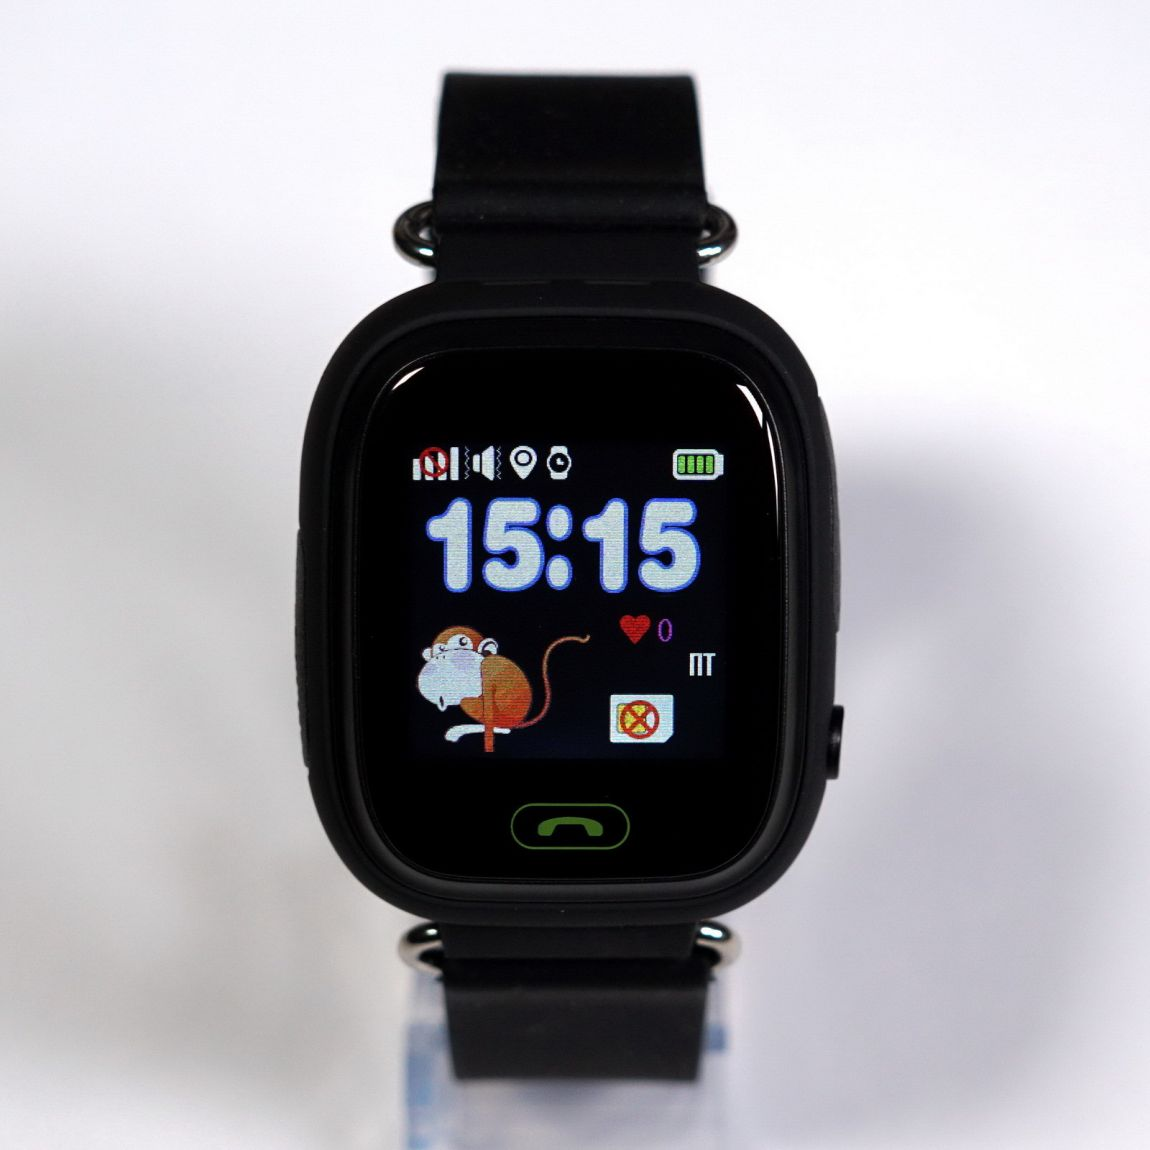 ef63787c68d Lastele mõeldud käekell GPS SMART BABY WATCH GW100/Q90